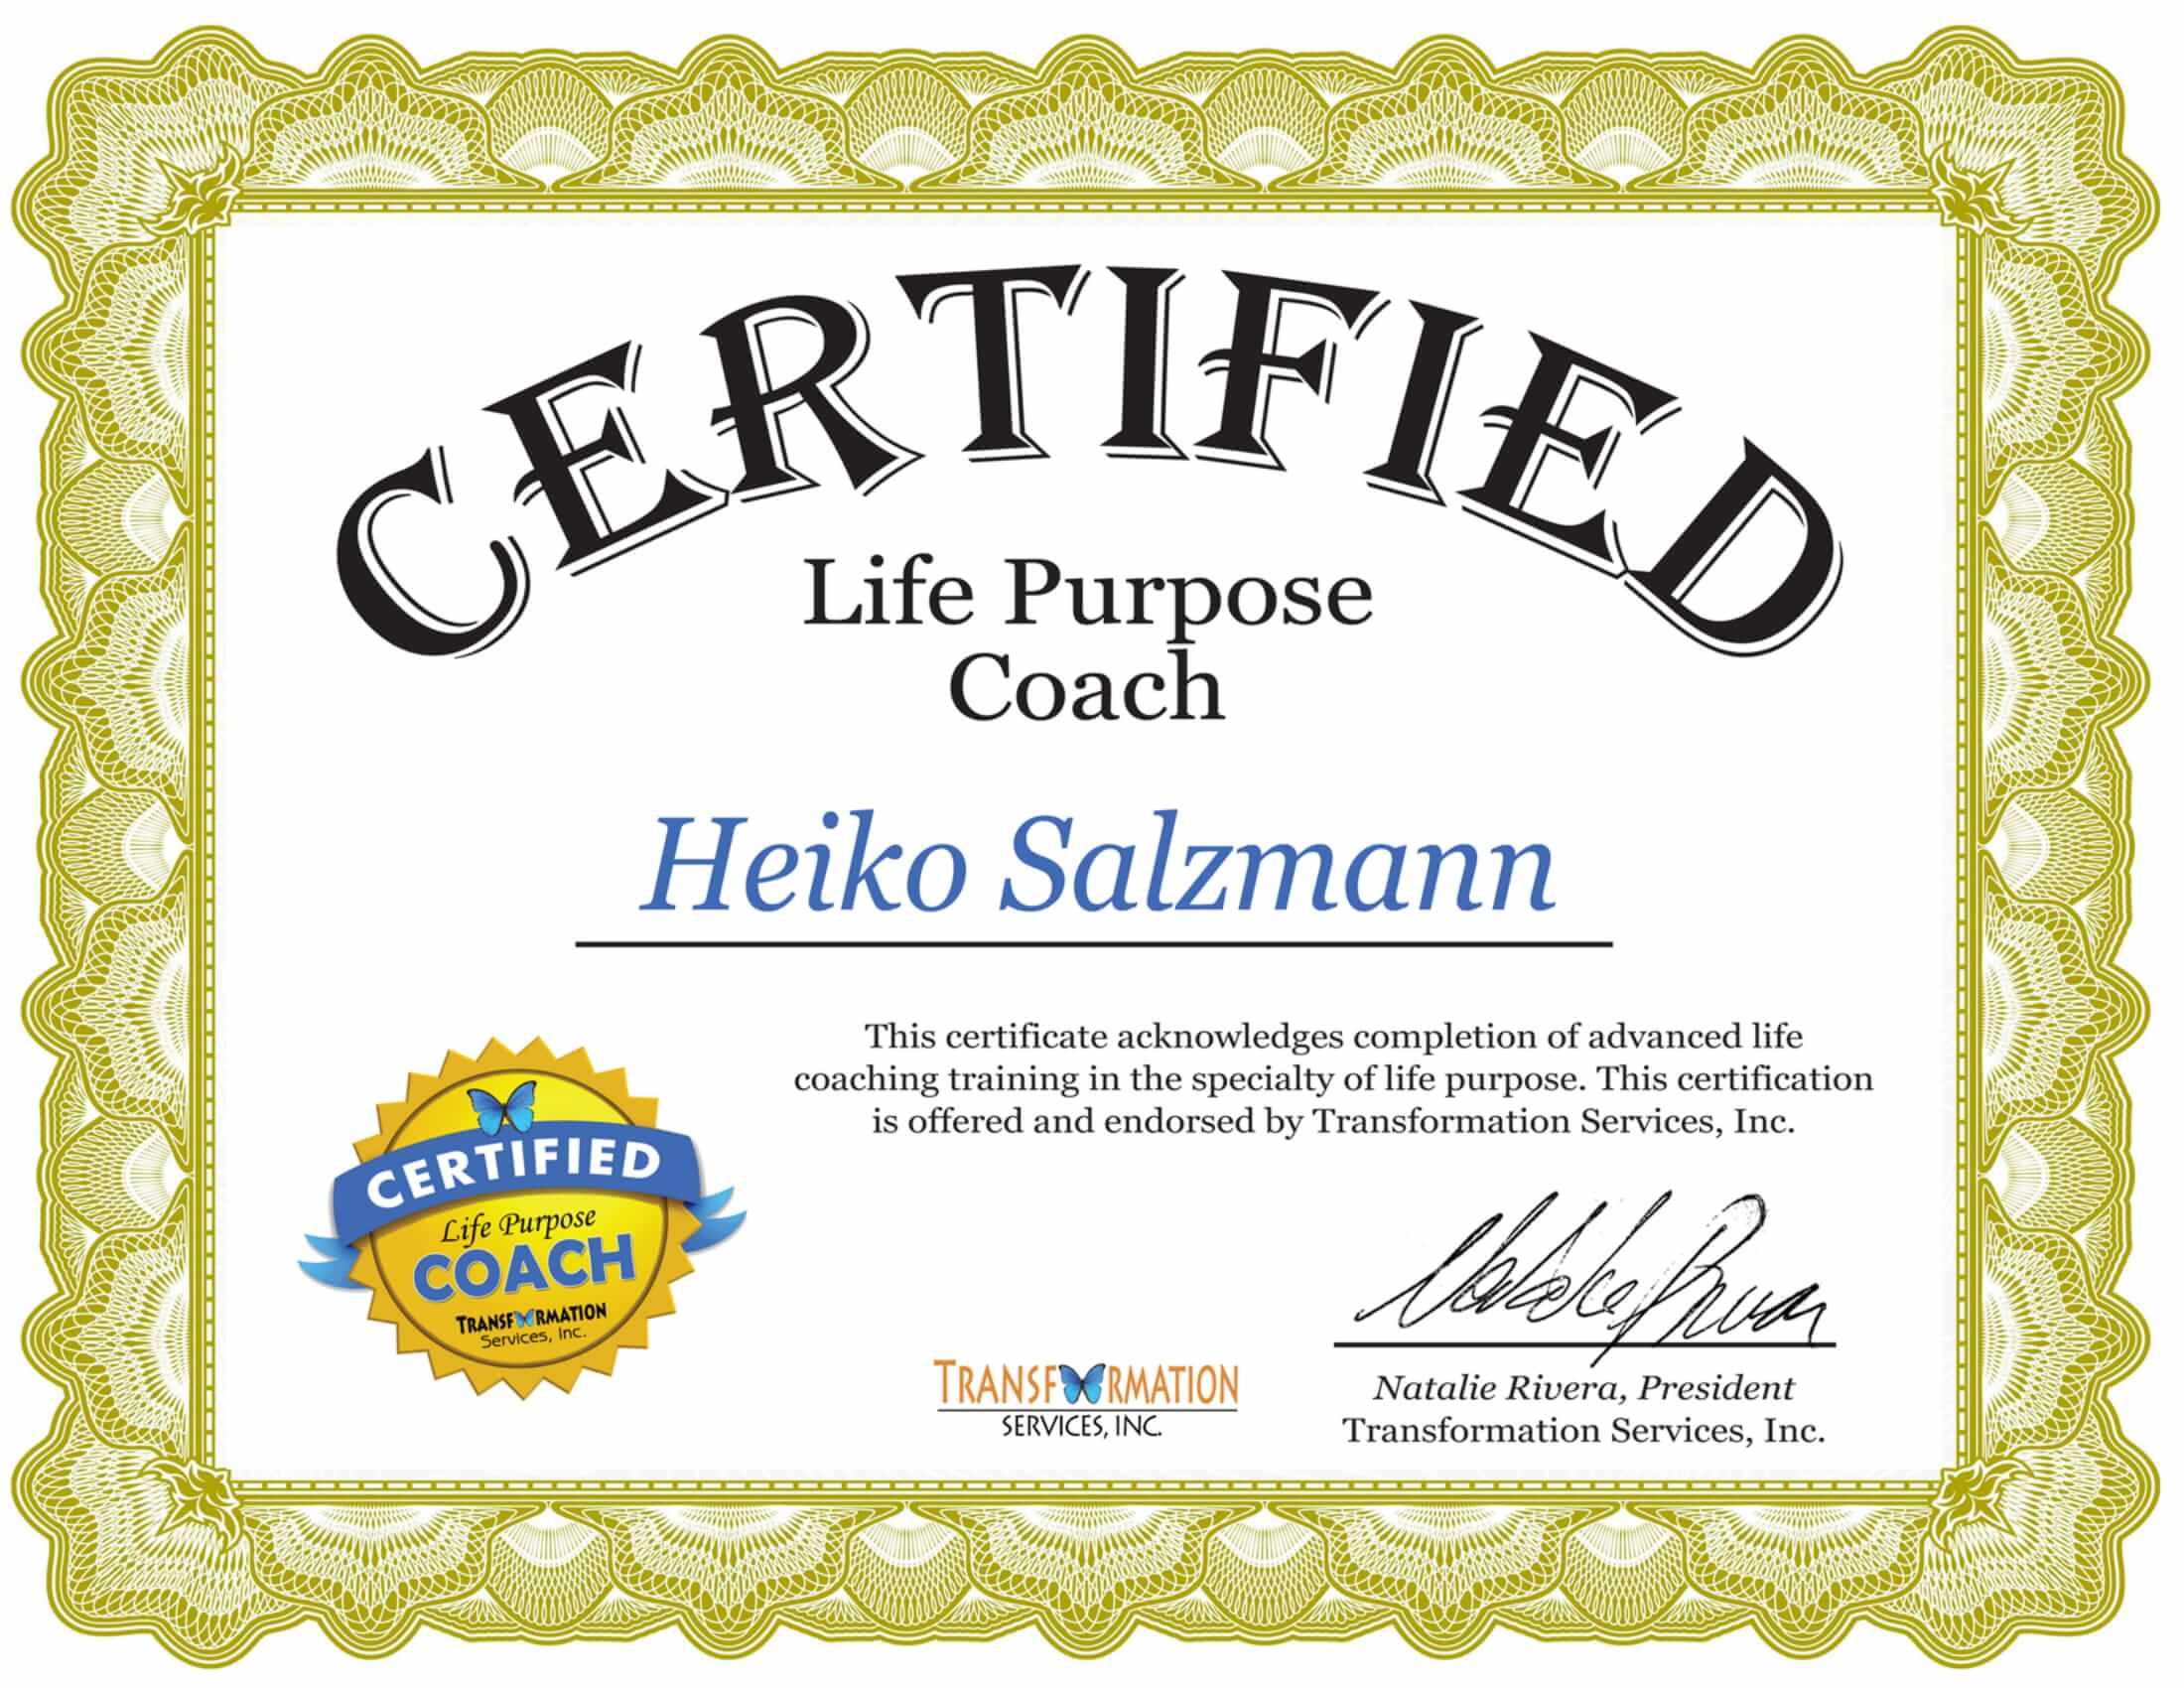 lifepurposecoach_zertifizierung_heikosalzmann